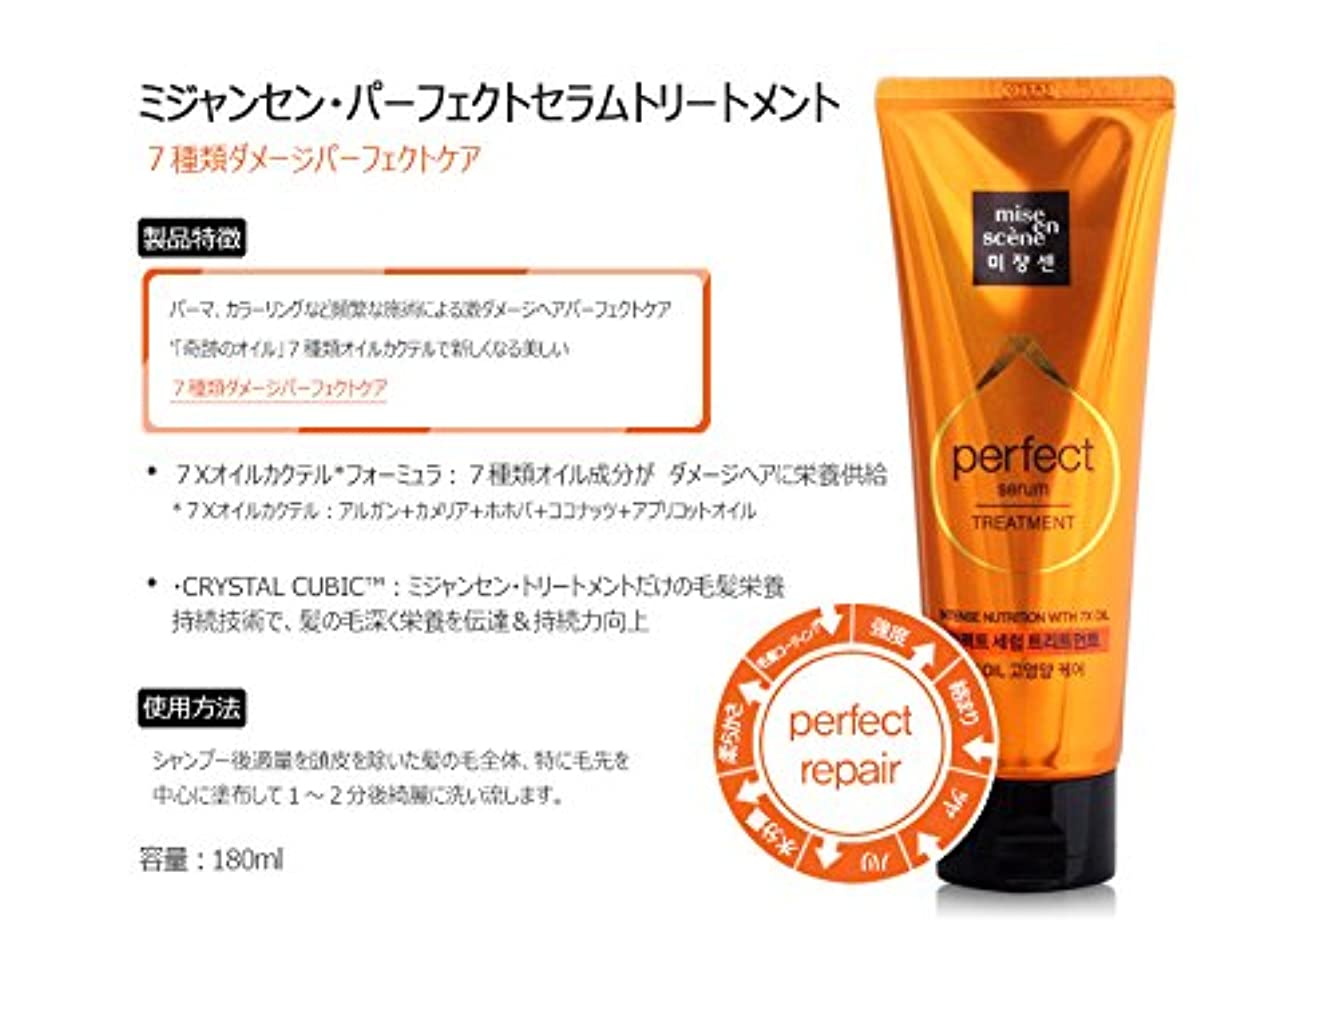 [miseenscene]perfect serum treatment 180ml